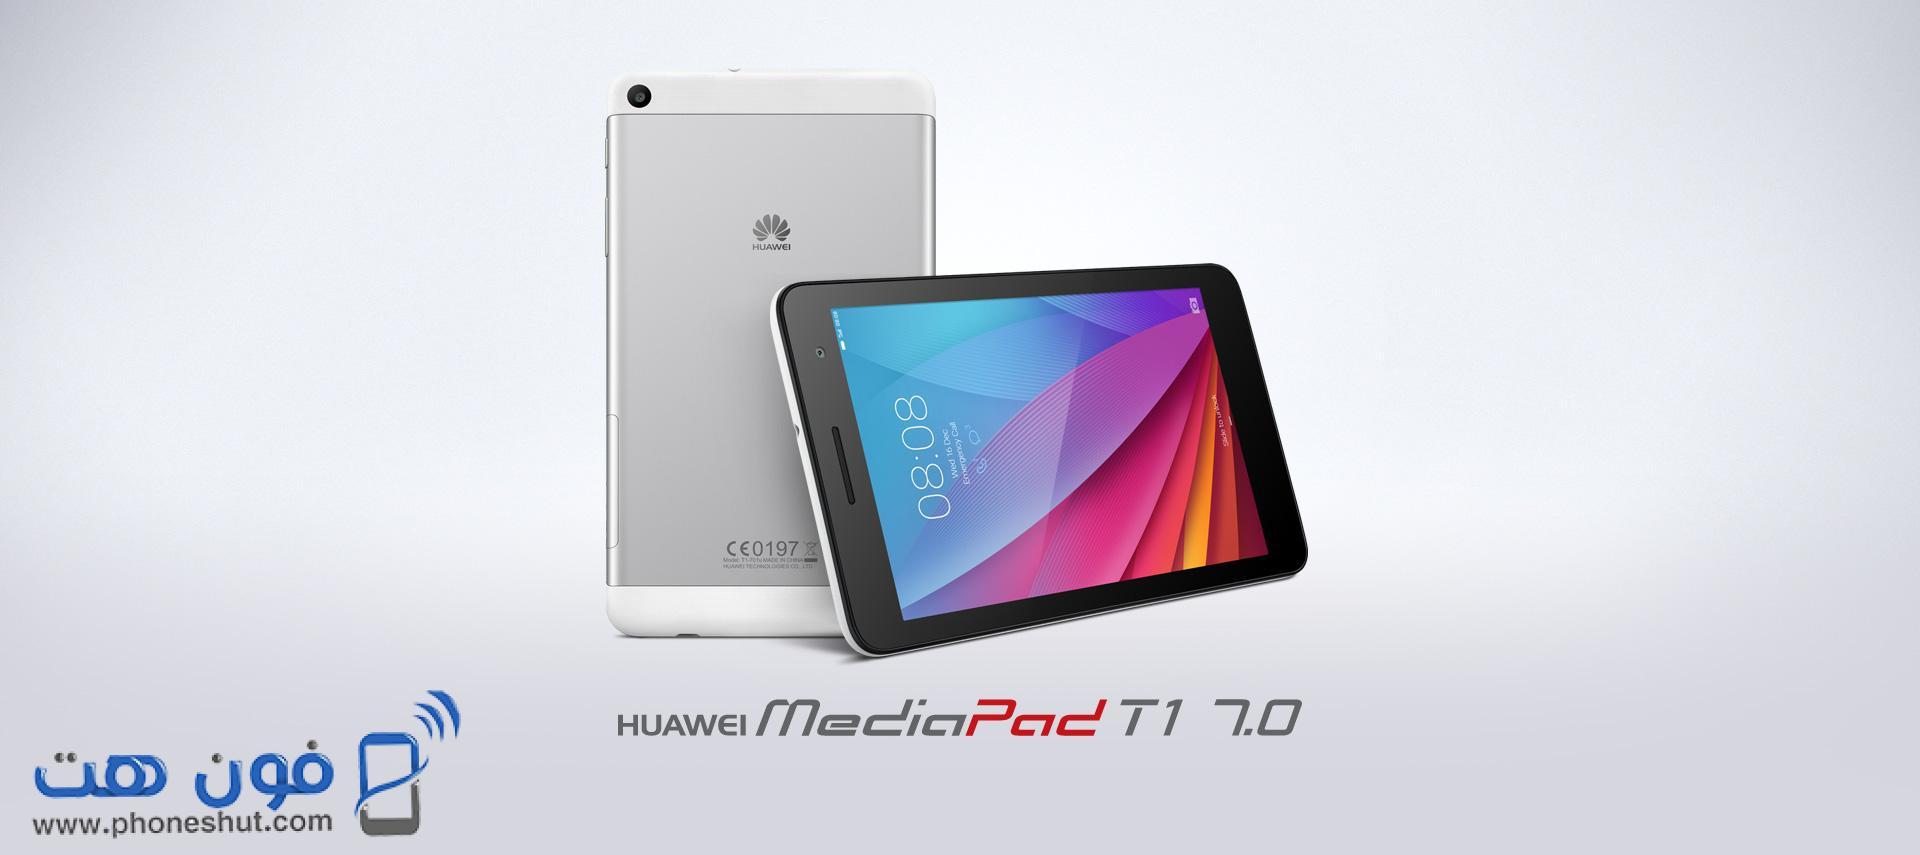 مواصفات Huawei MediaPad T1 7.0